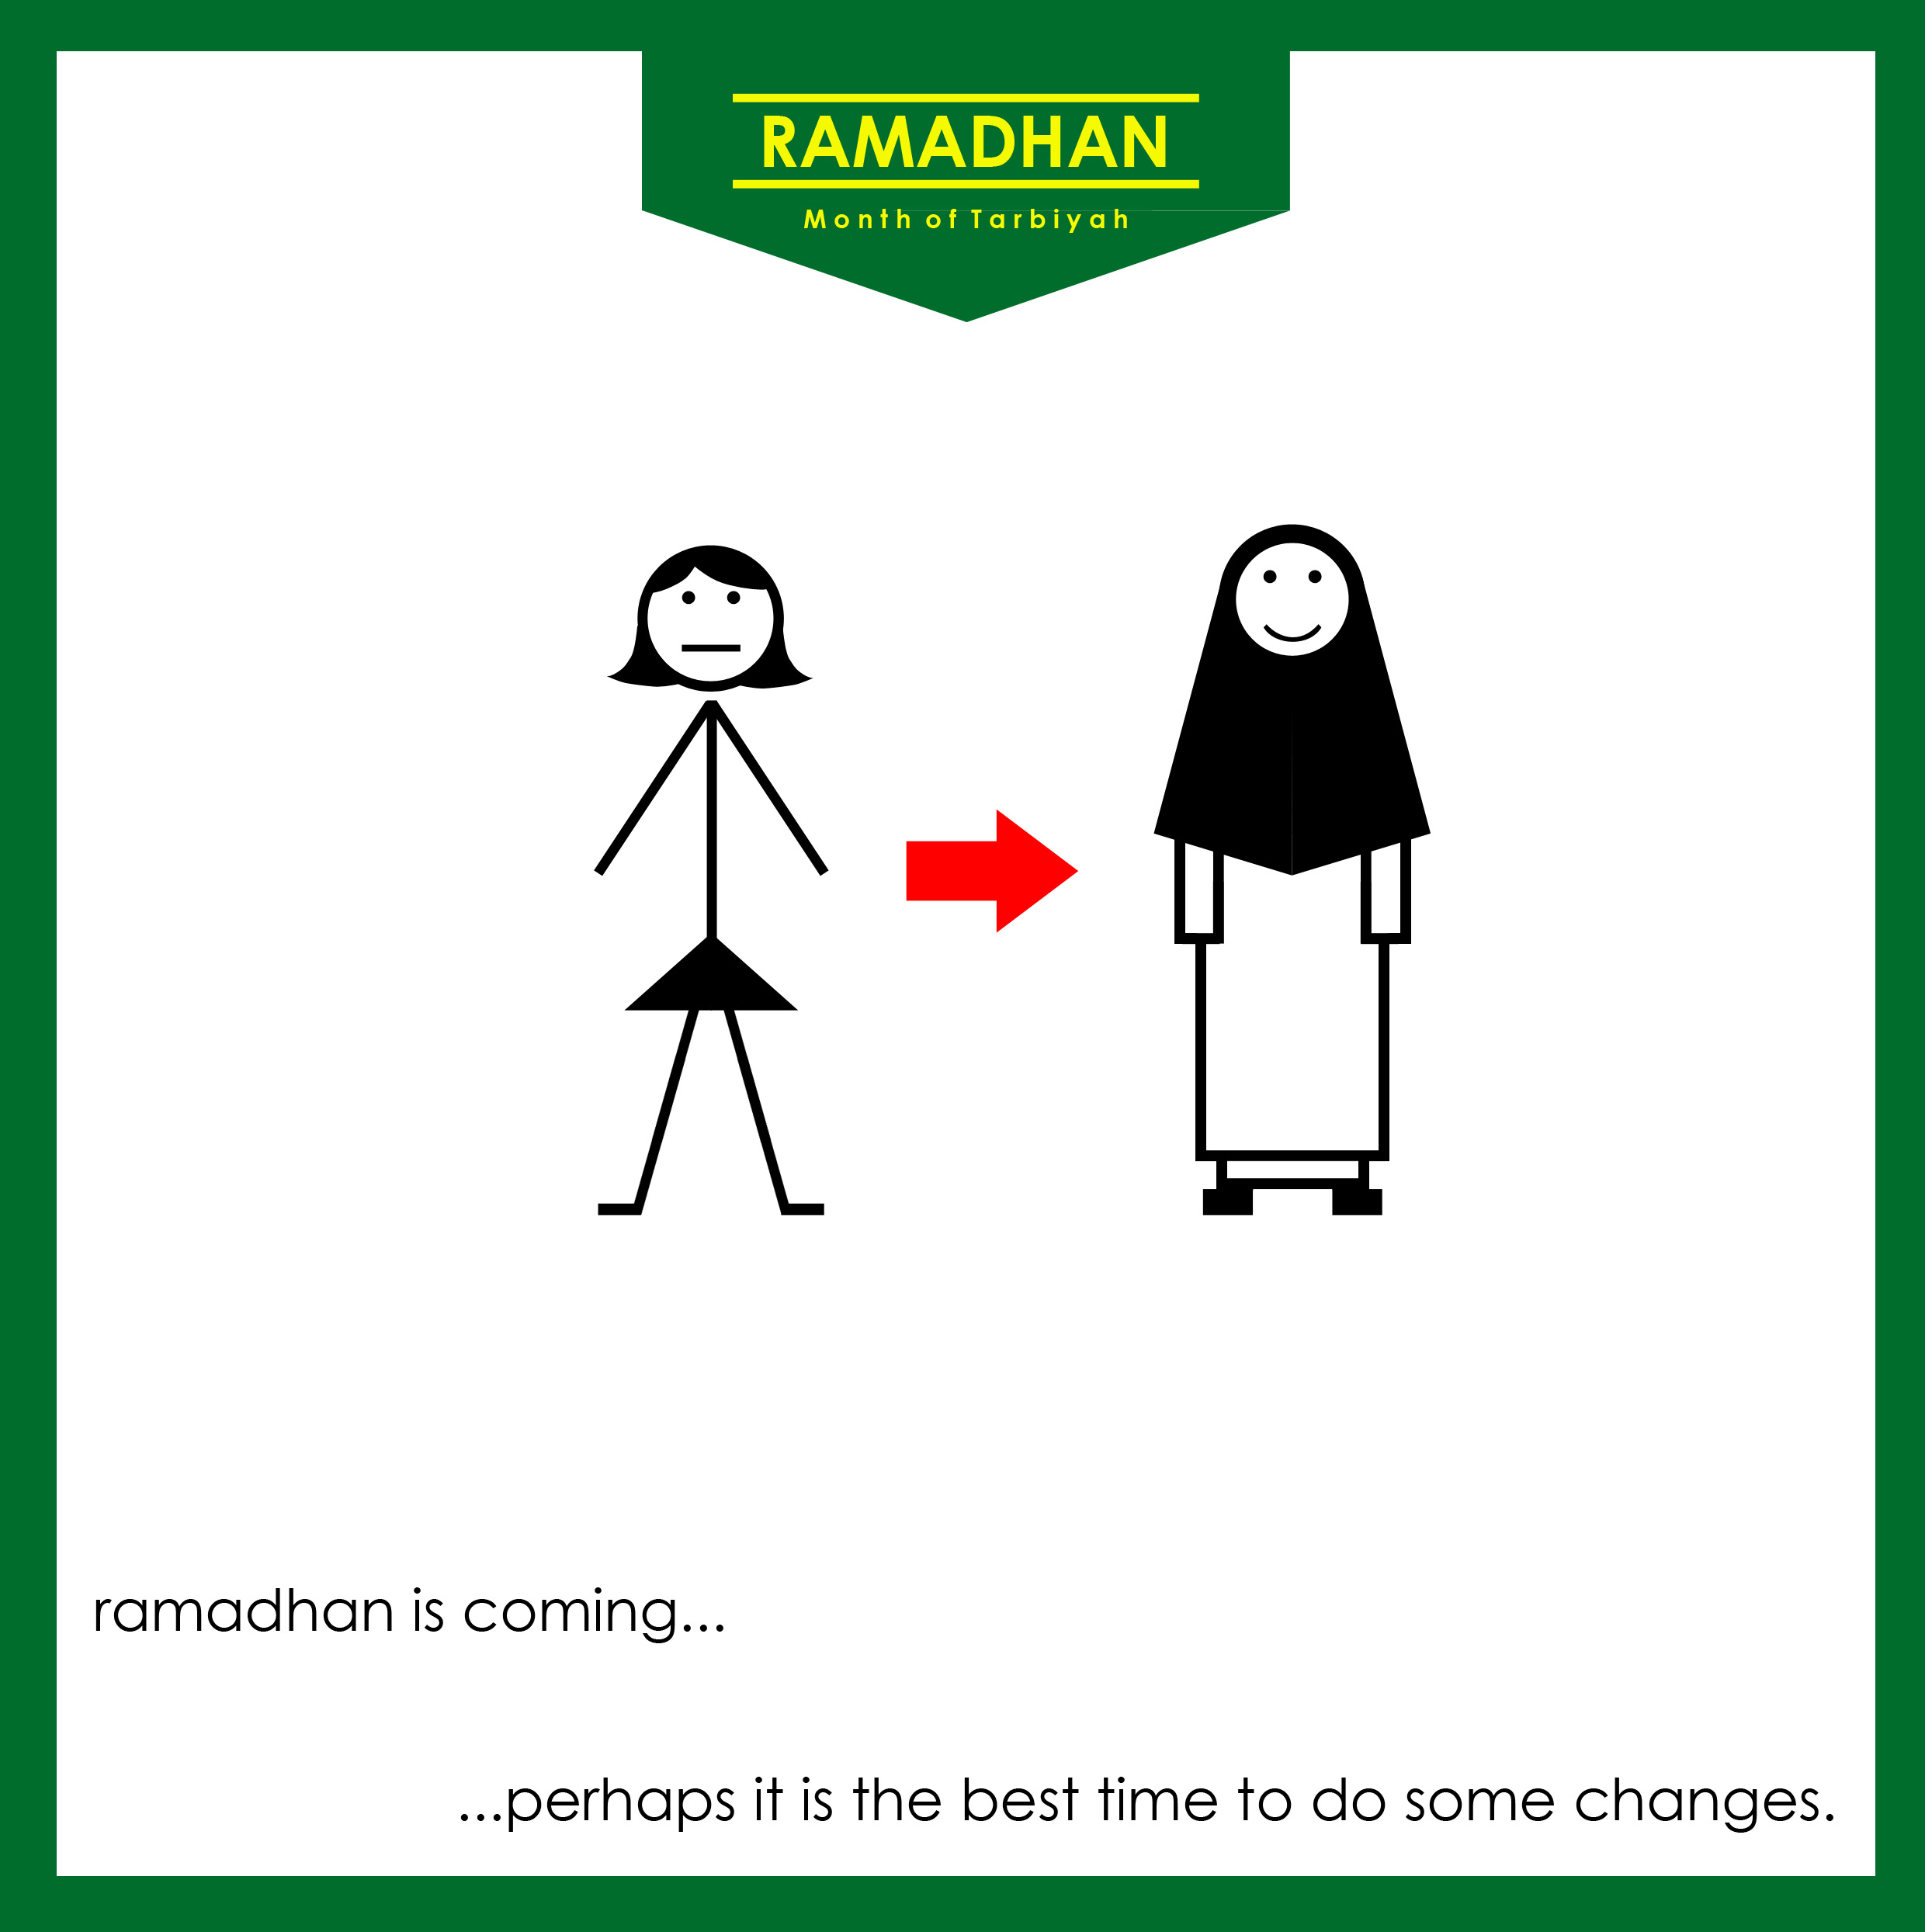 ramadhan__month_of_tarbiyah__by_abuzayd Faszinierend Leiste Für Led Stripes Dekorationen